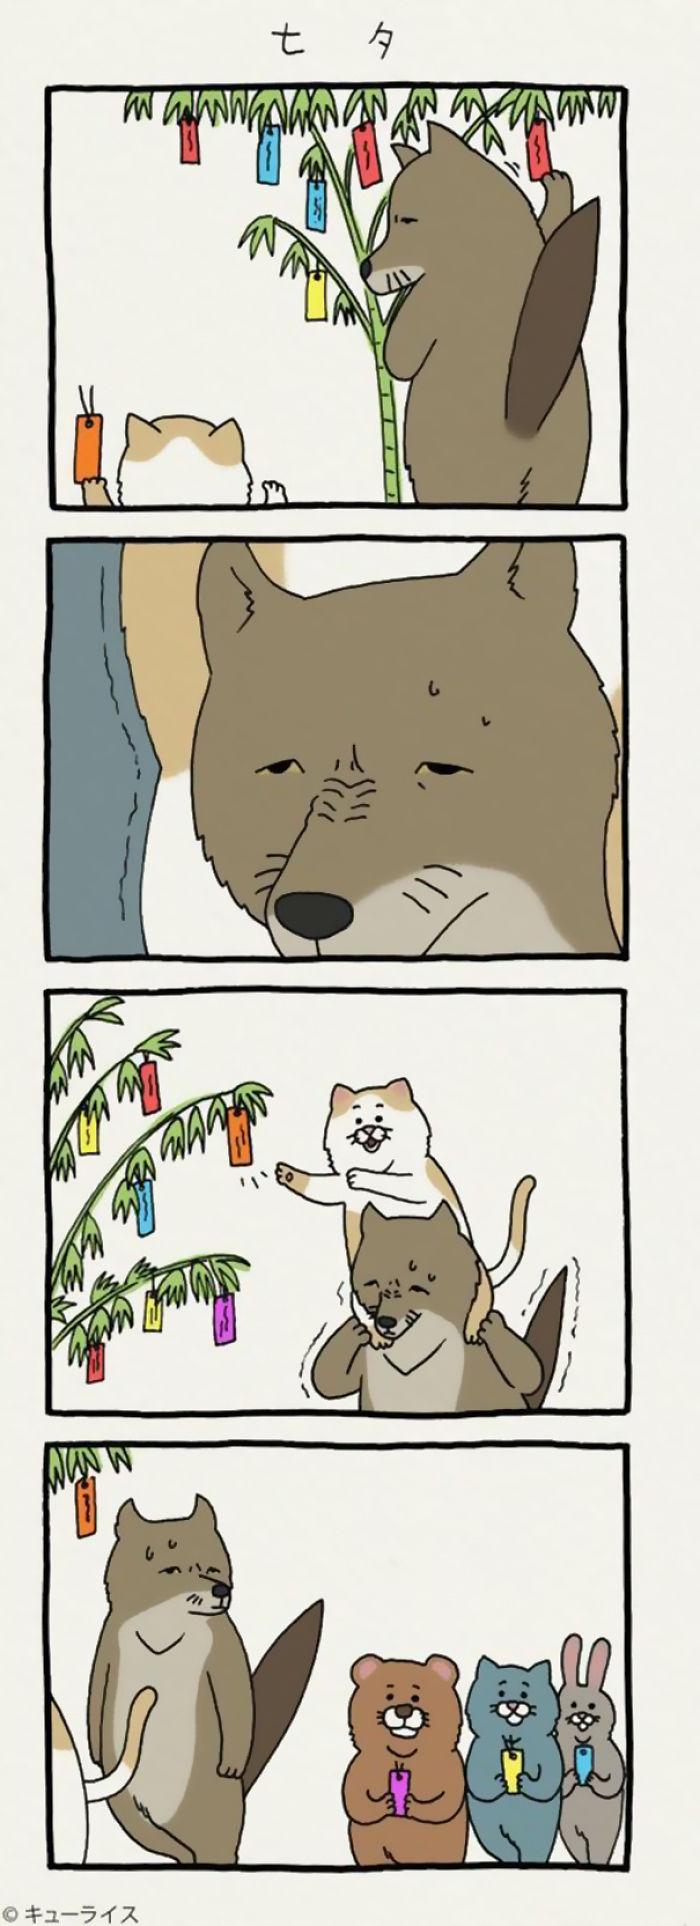 Dog-cartoon-comics-qrais-japan